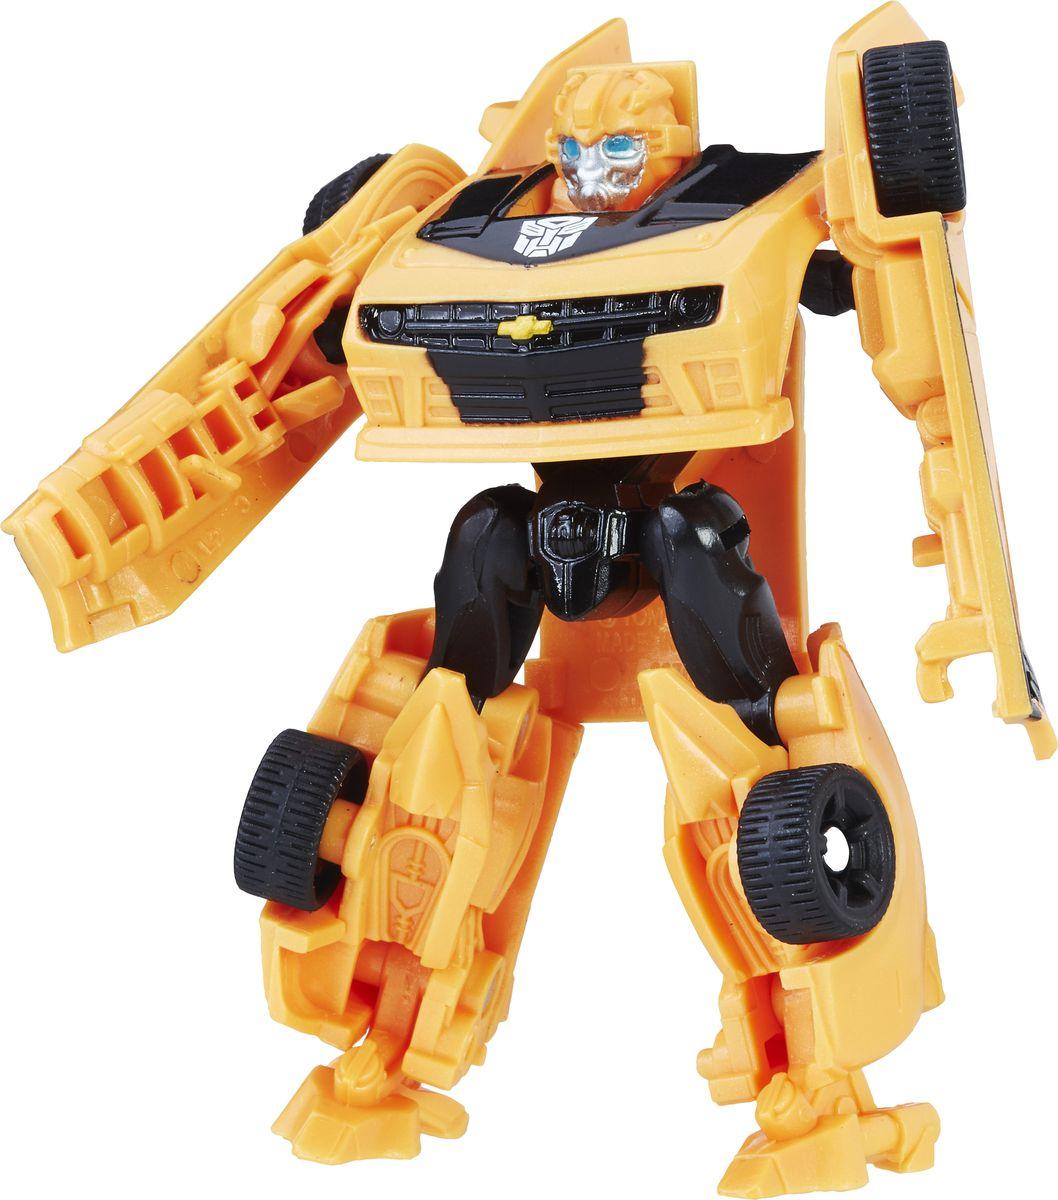 Transformers Трансформер Bumblebee автомобиль dickie трансформер bumblebee желтый 3113000